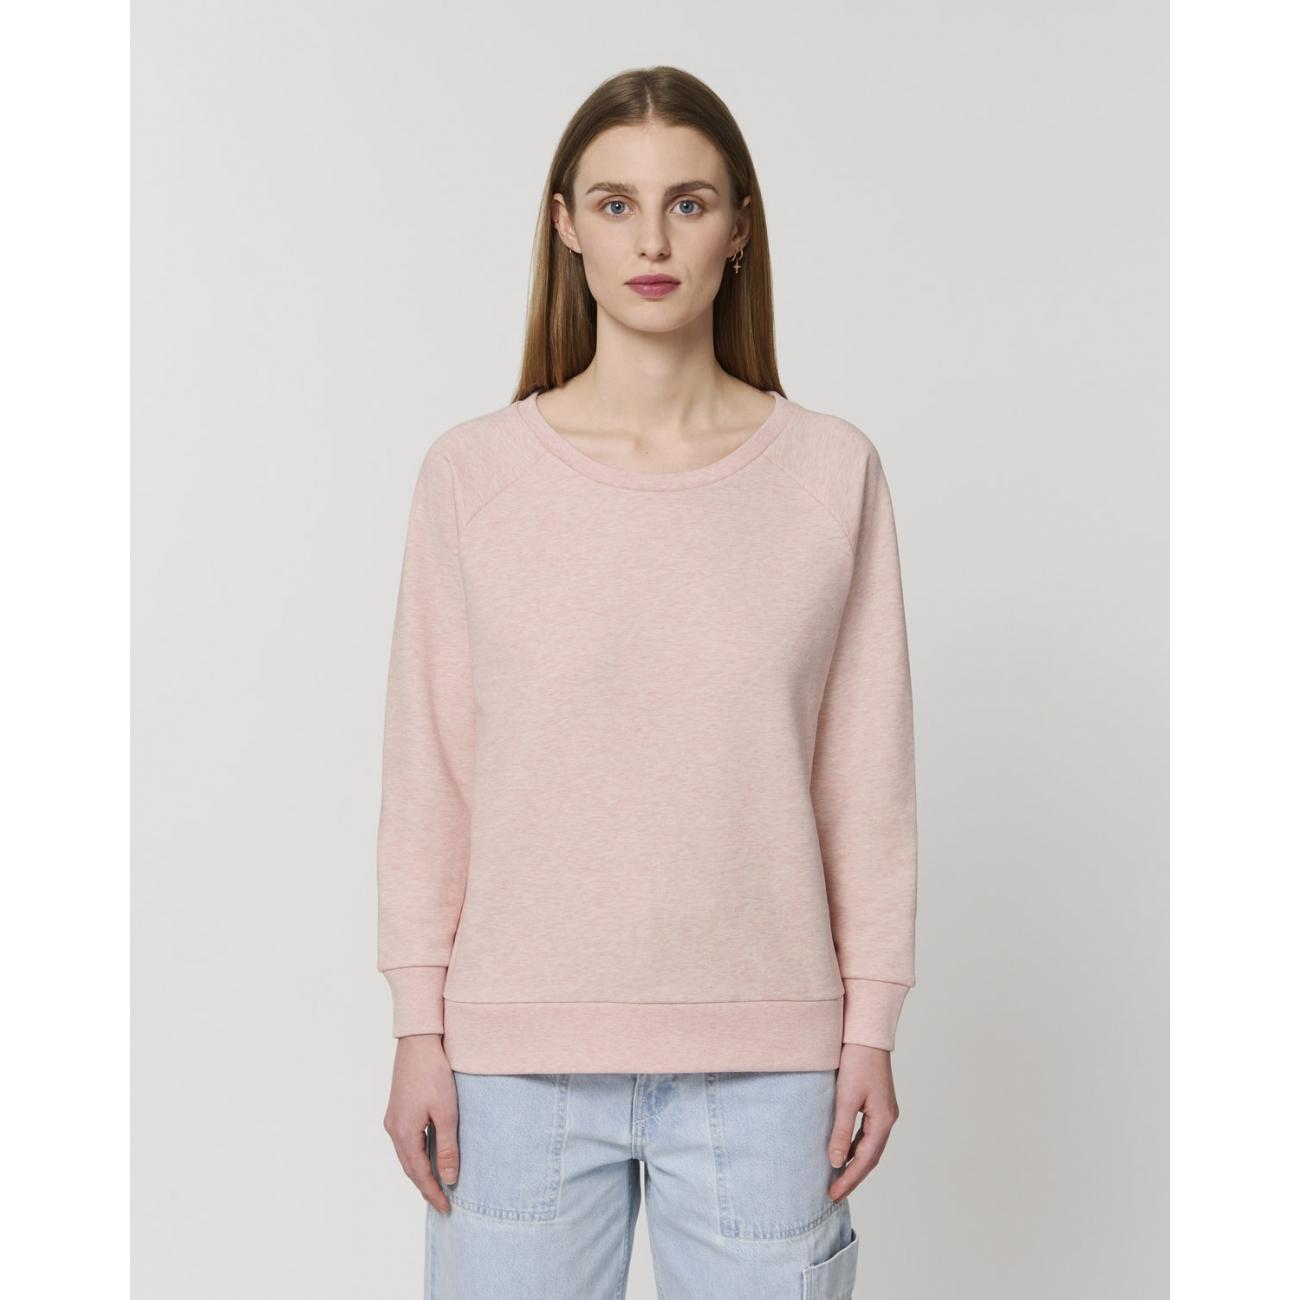 https://tee-shirt-bio.com/8825-thickbox_default/sweat-col-rond-rose-creme-chine-coton-bio-ethique-stella-dazzler.jpg